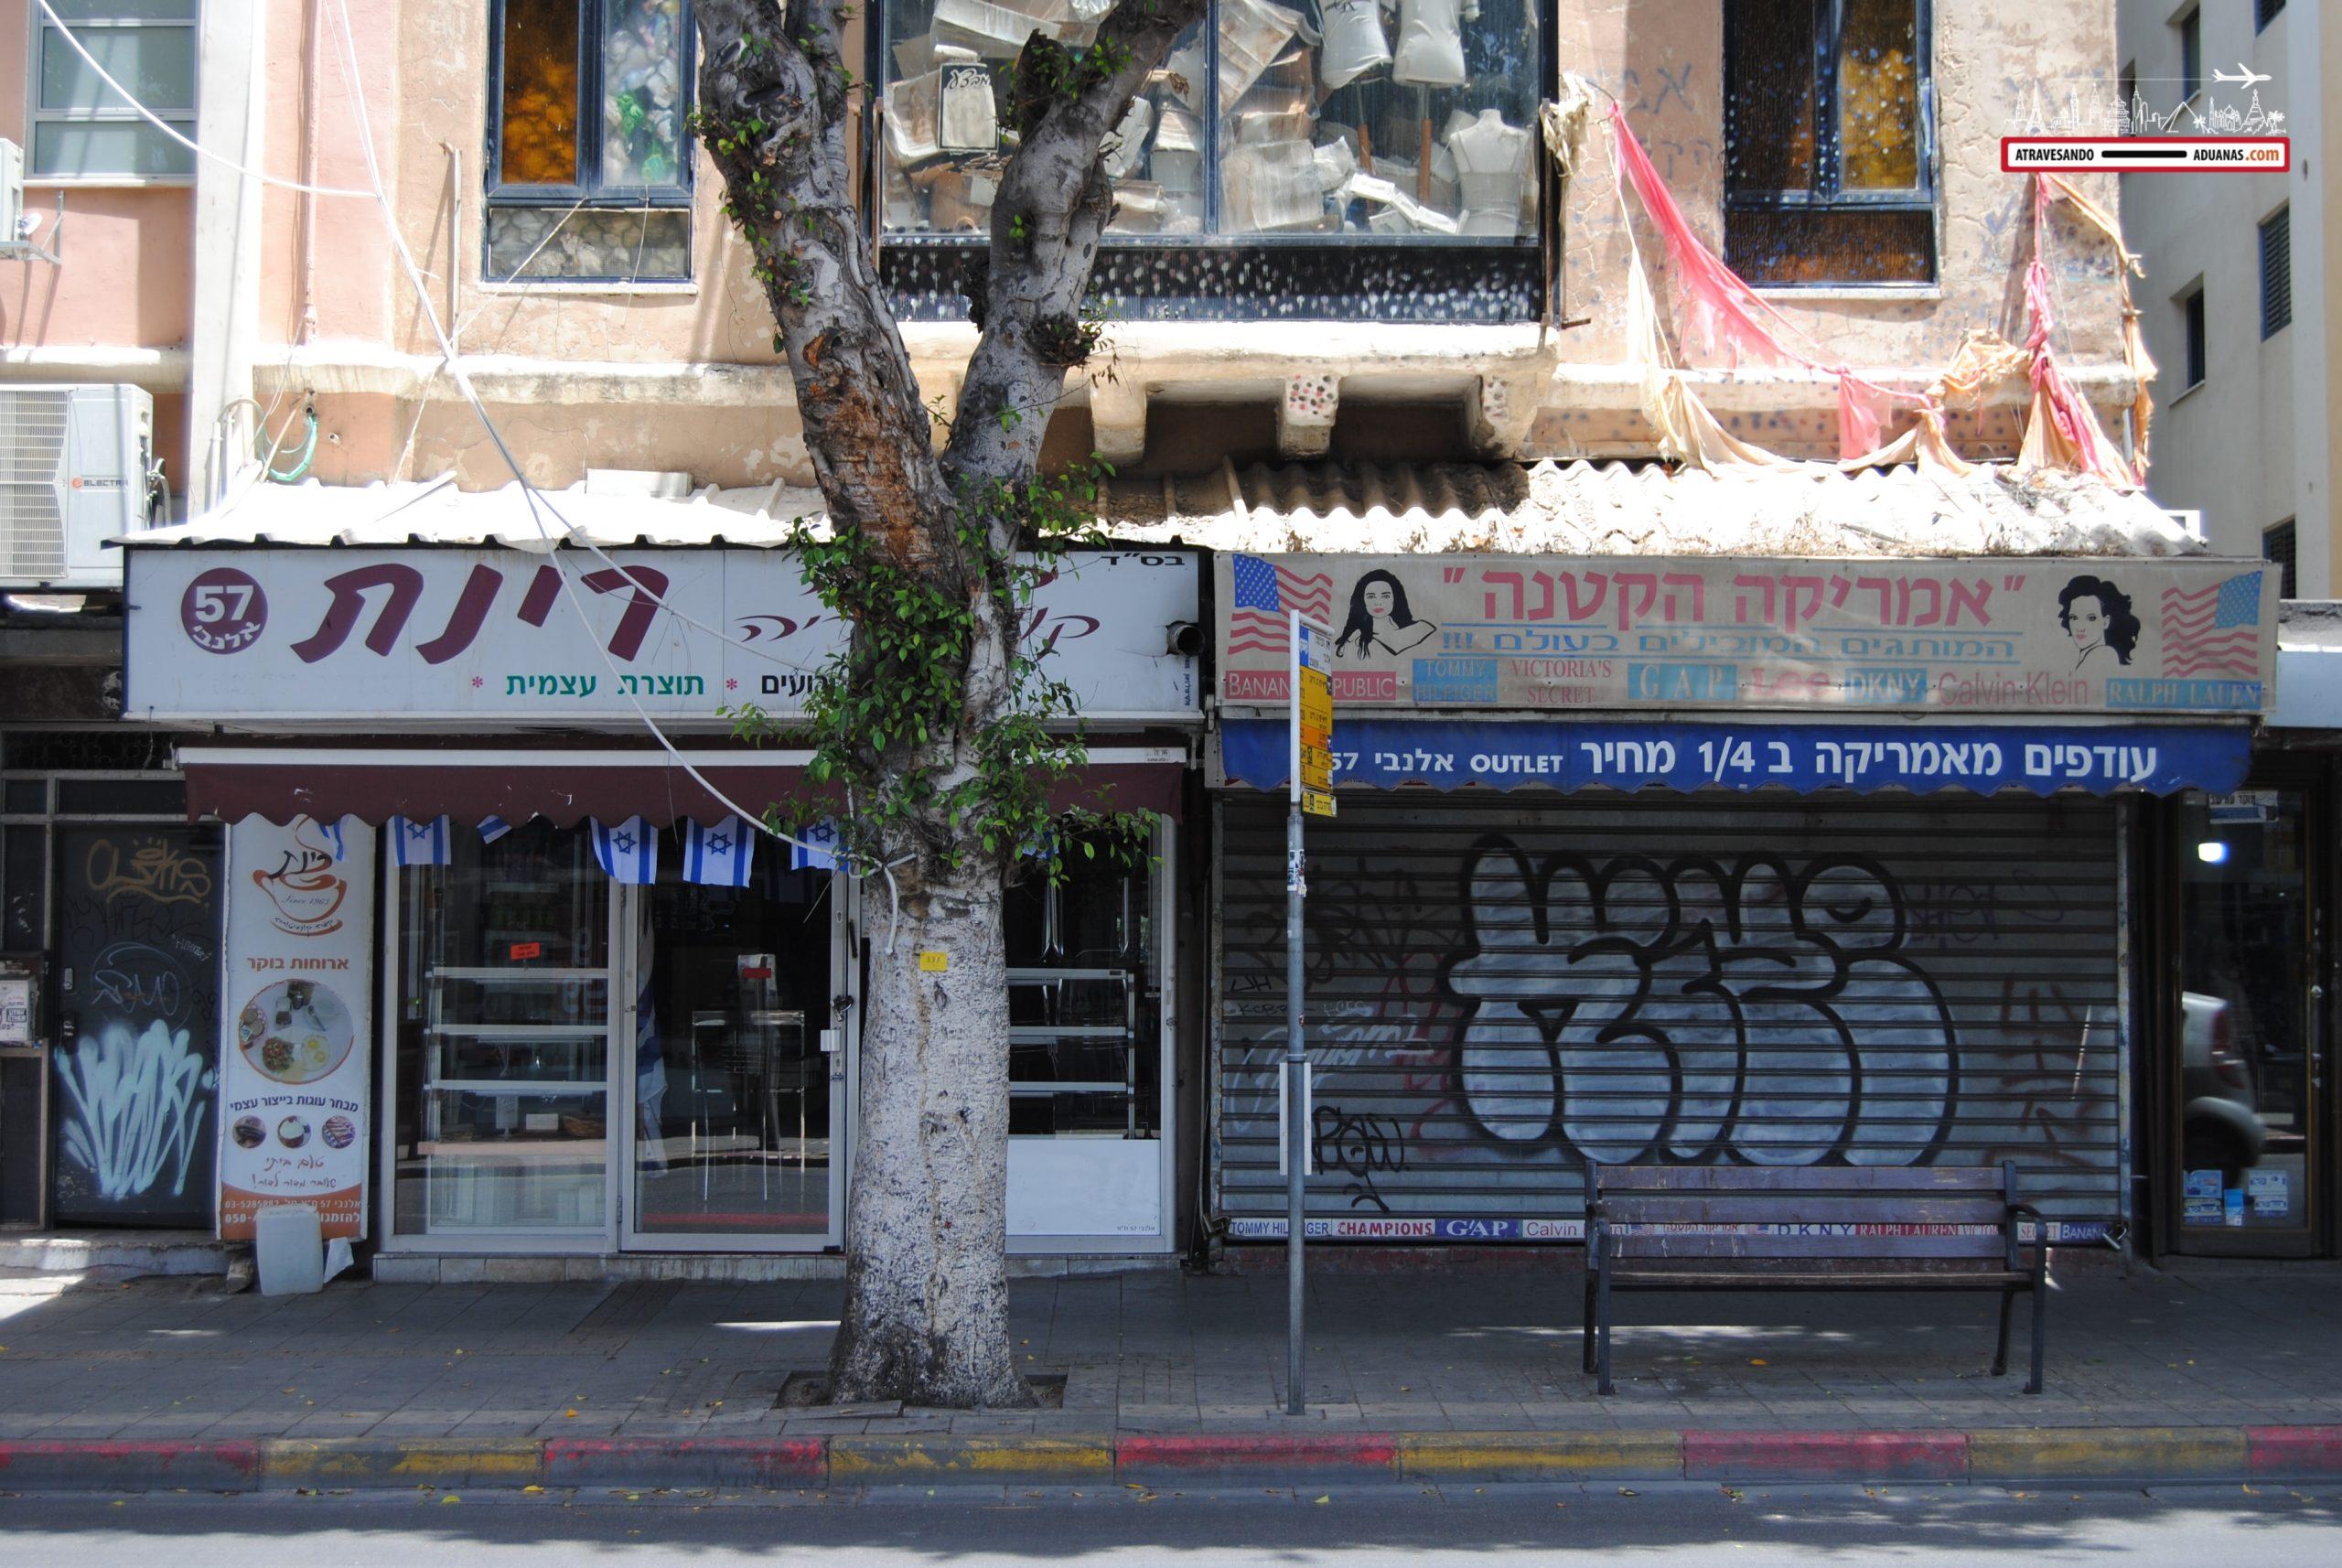 Curiosa tienda en Tel Aviv